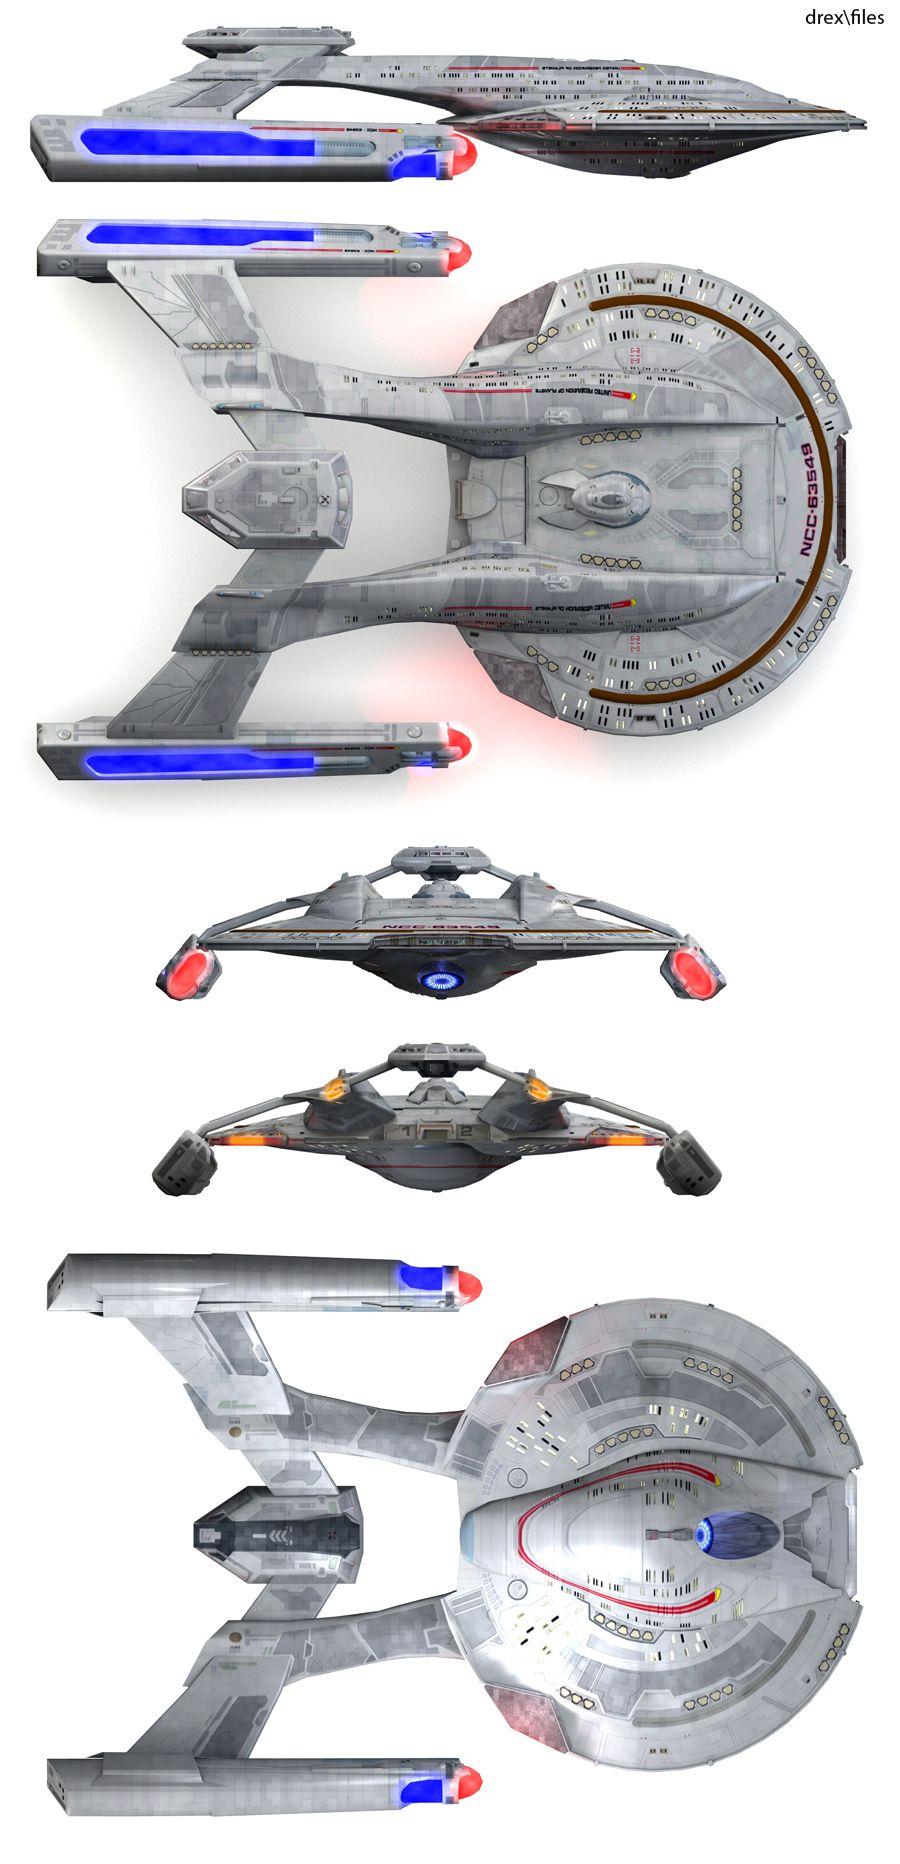 Akira Class Starship One Of The Best Trek Ship Designs A Sort Of Future Nx Class Configuration And Design Star Trek Starships Star Trek Ships Star Trek Art,Simple Wedding Cupcake Designs